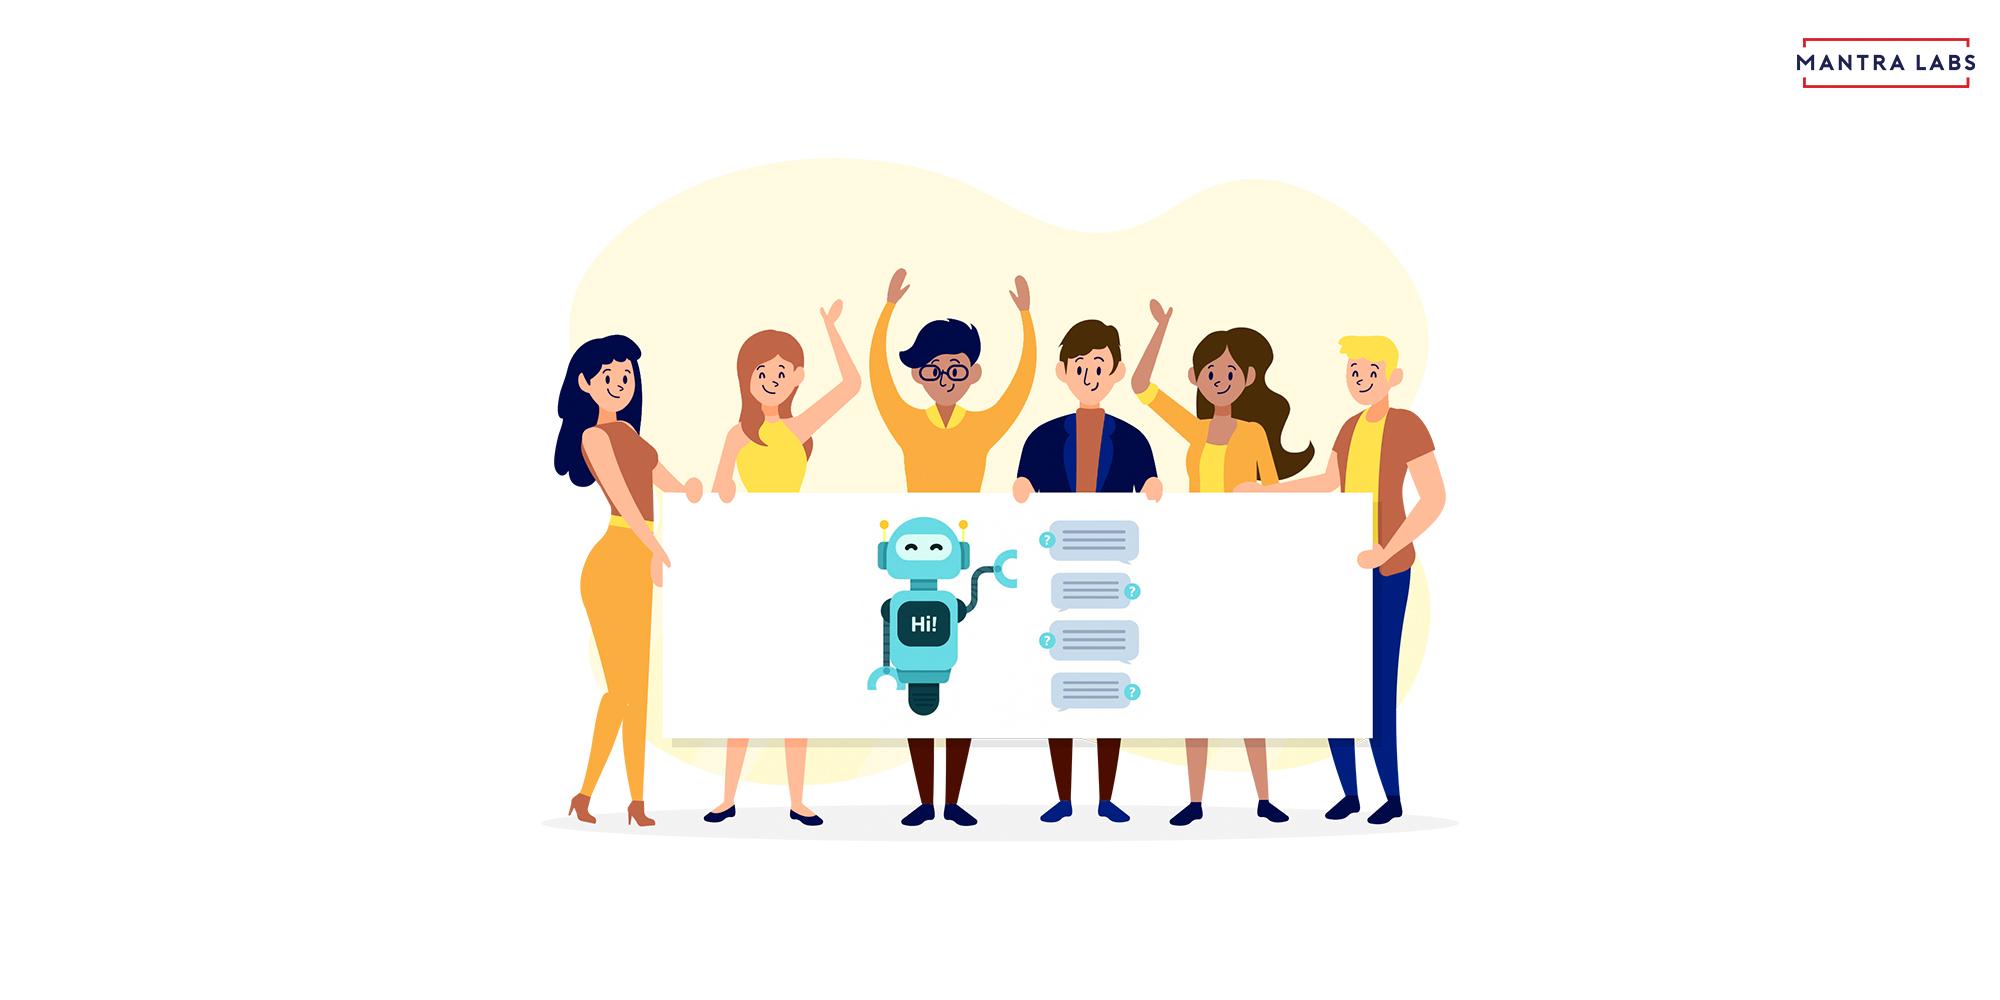 Chatbot Effecting Indian Landscape